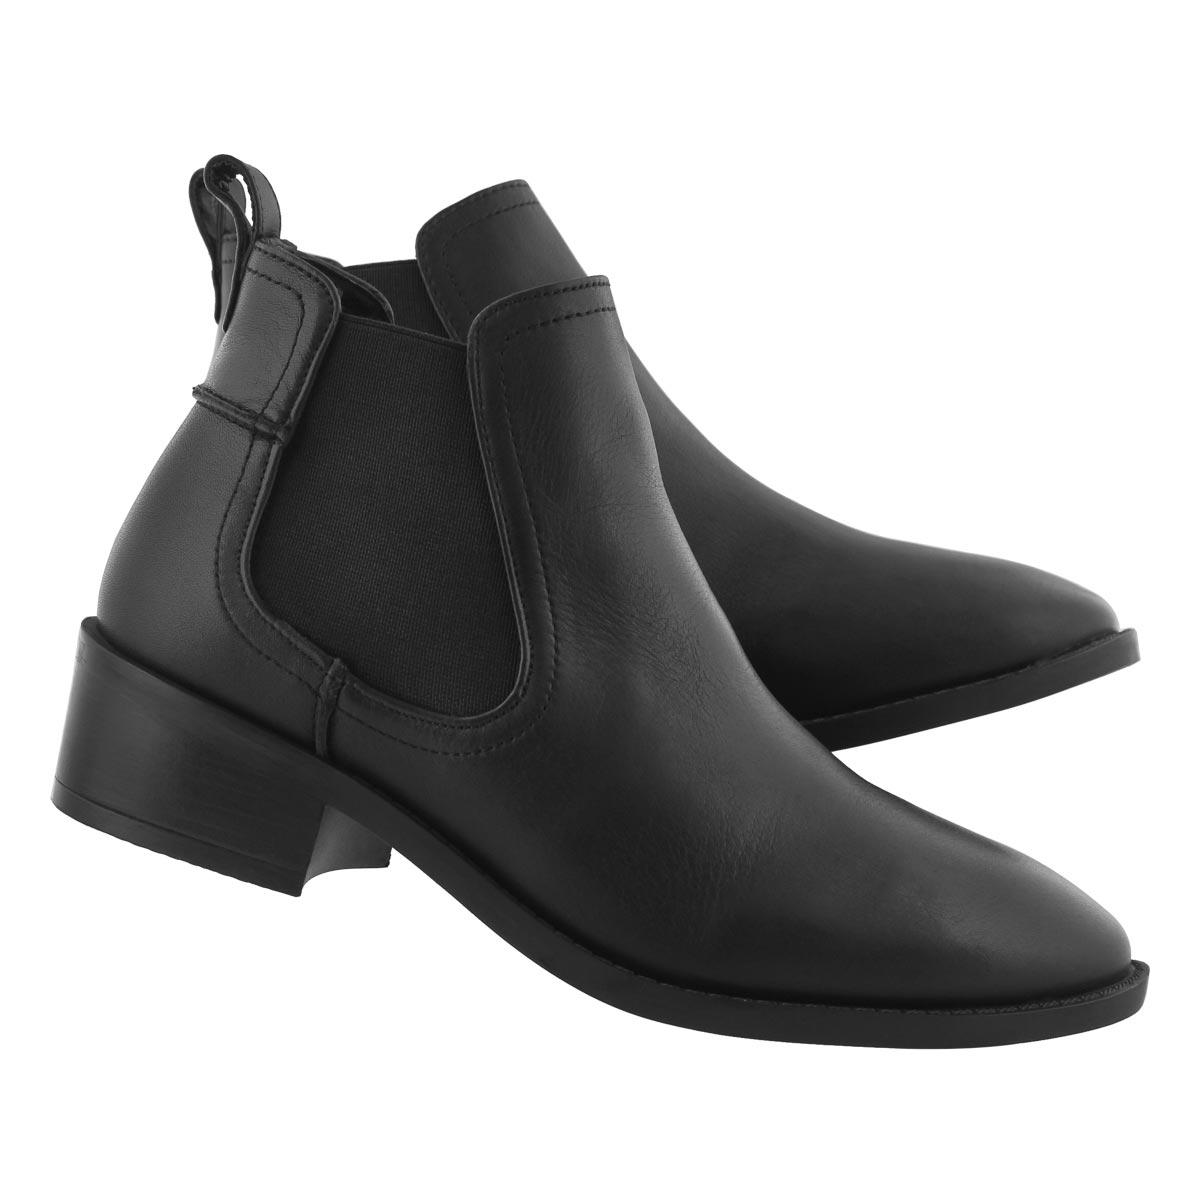 Lds MDenice black chelsea boot